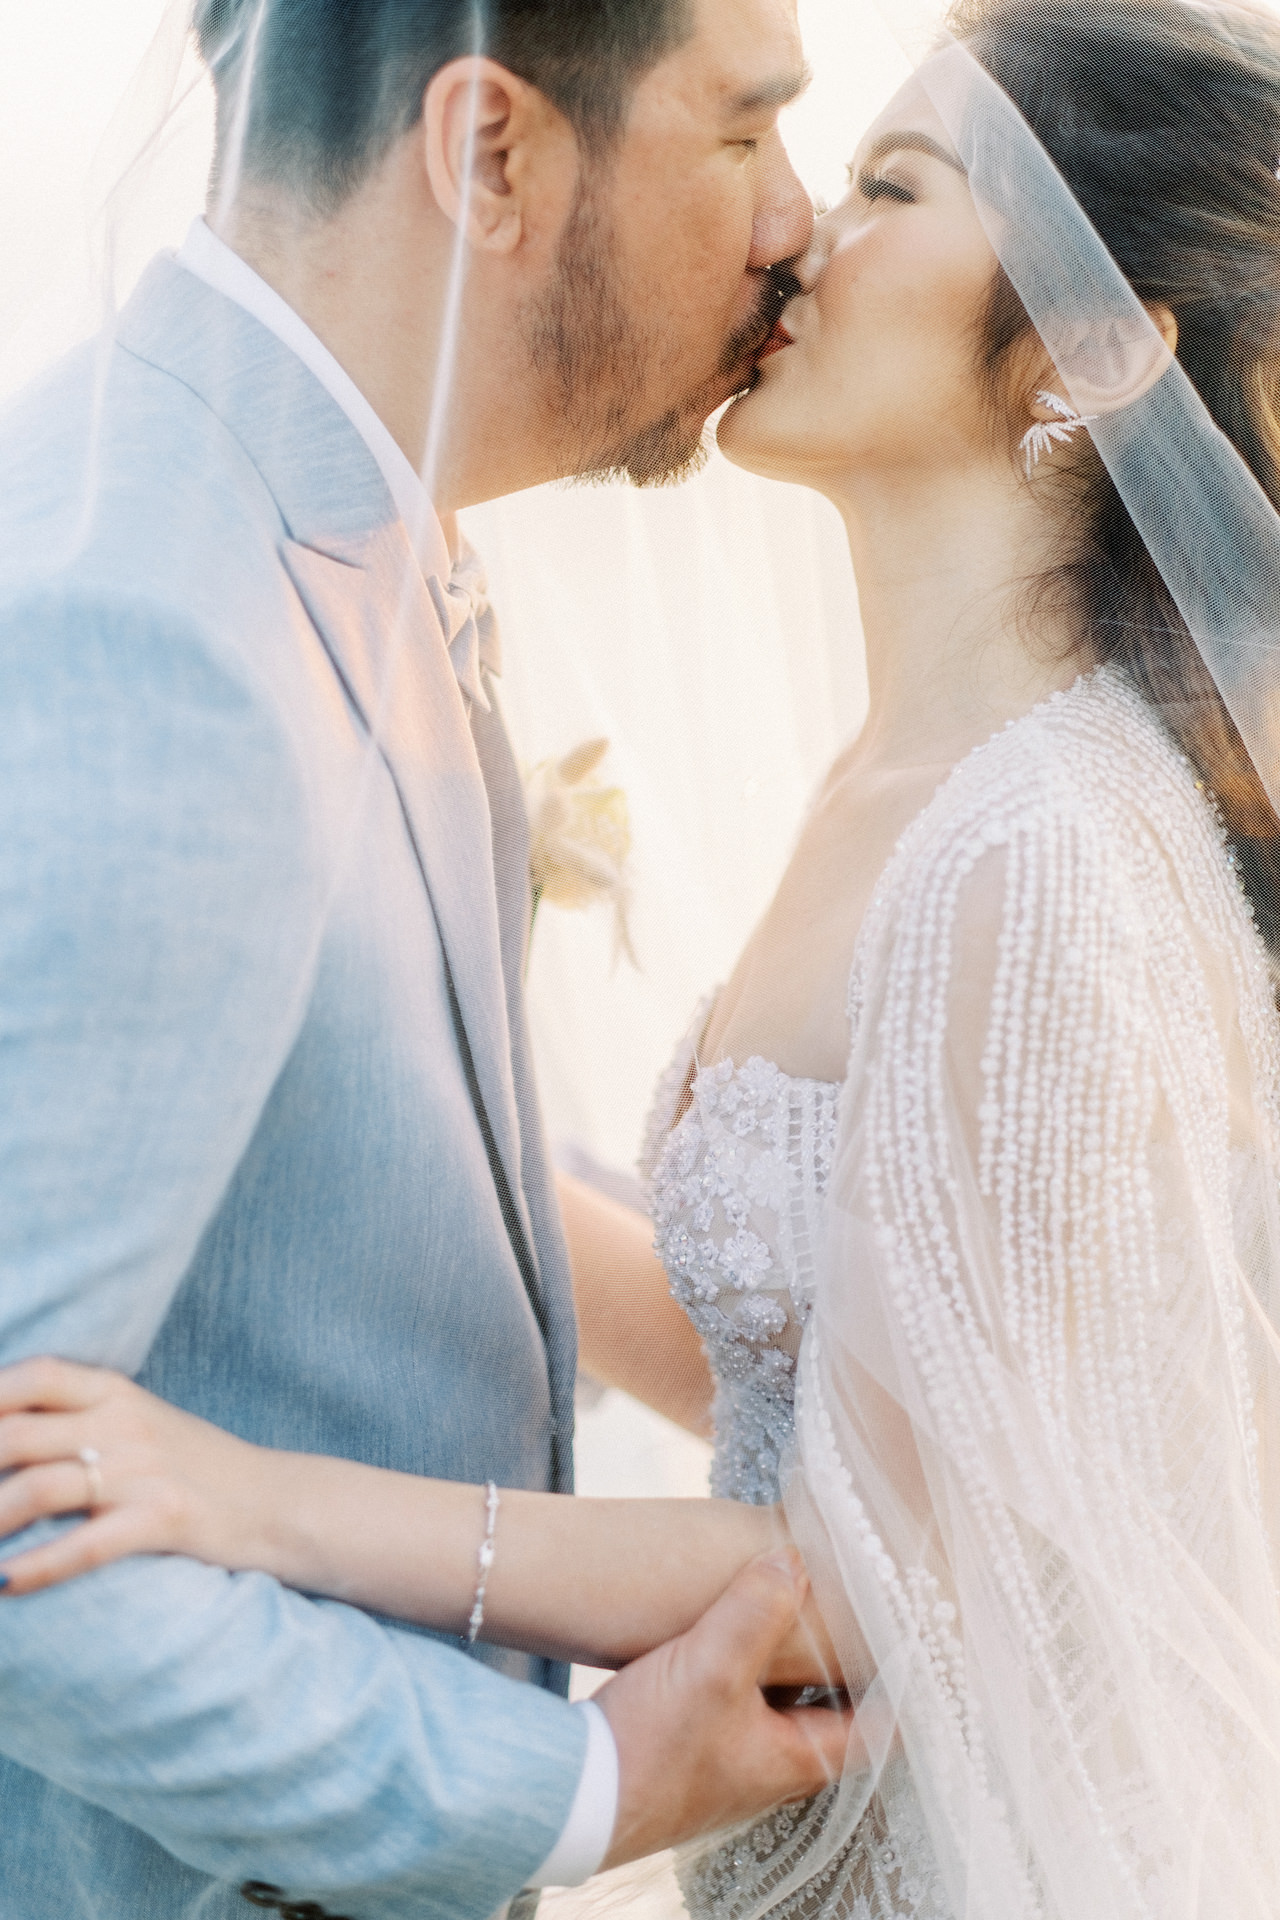 M&S: Shades of Blue Villa Plenilunio Bali Wedding 84